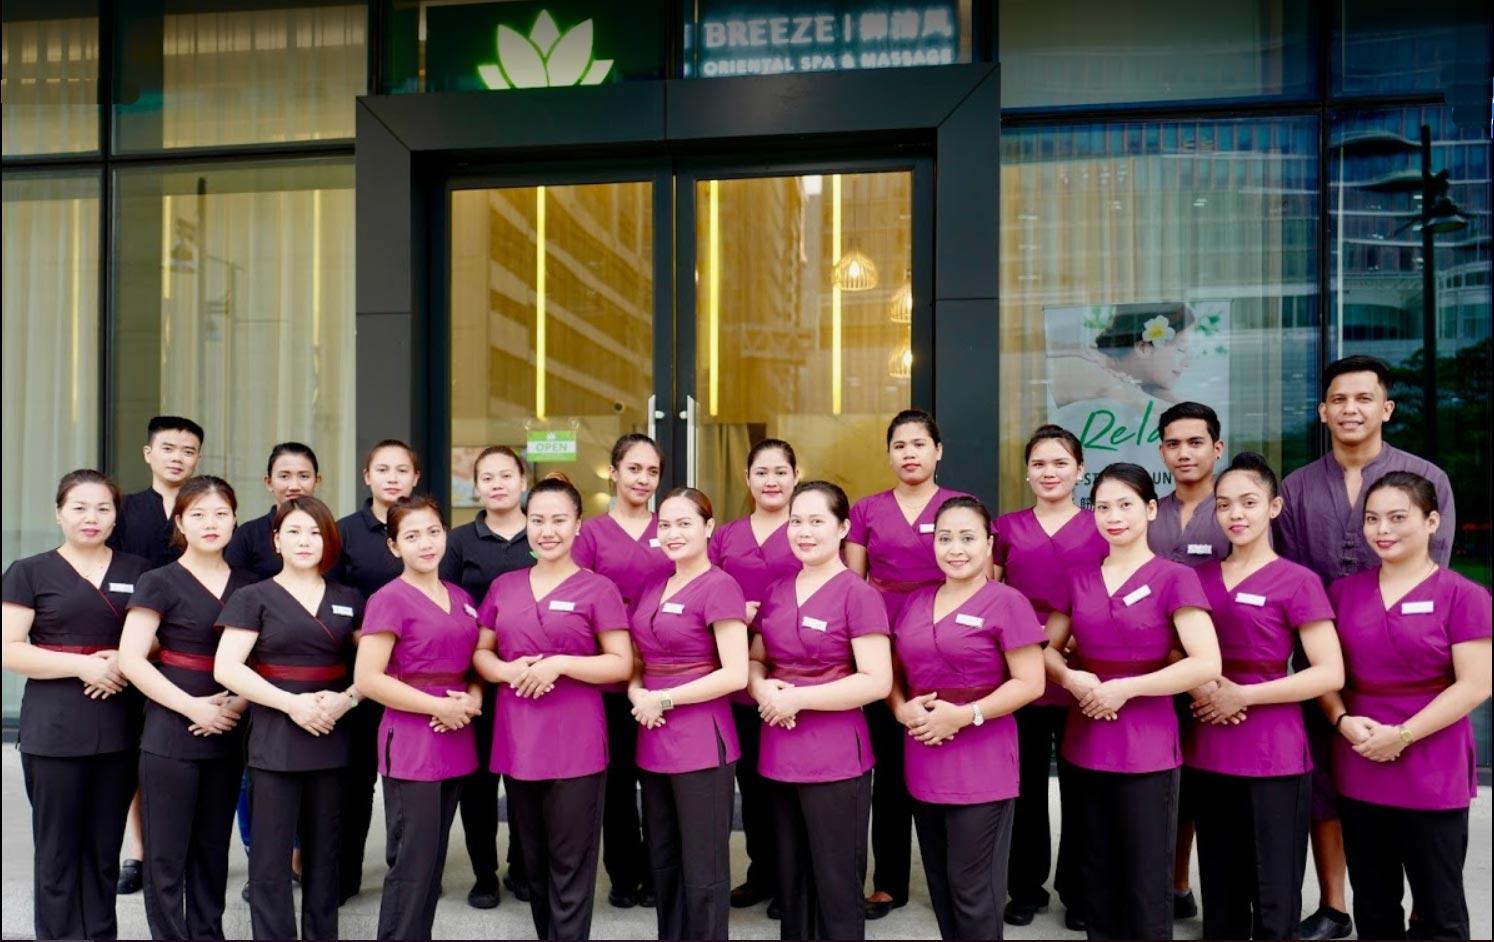 breeze-oriental-spa-massage-bgc-our-team